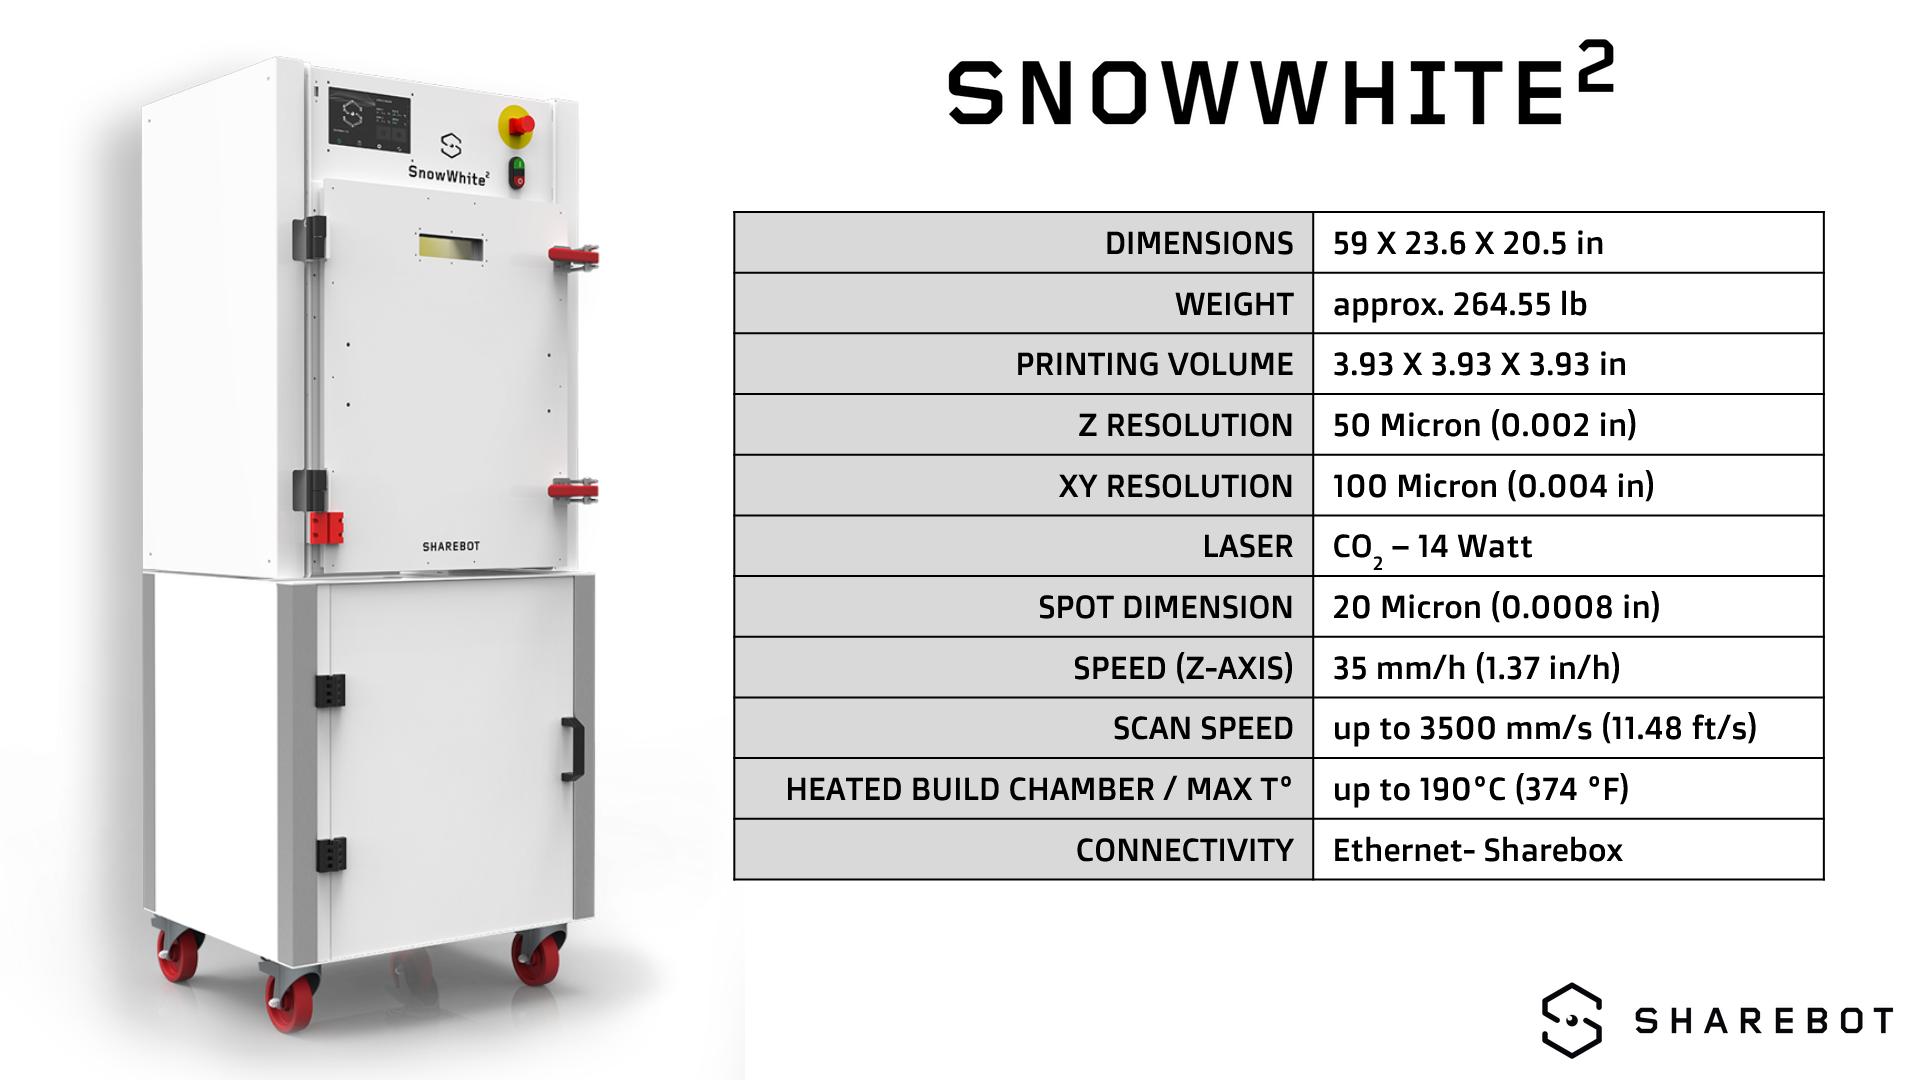 SnowWhite 2 US Technical Specs